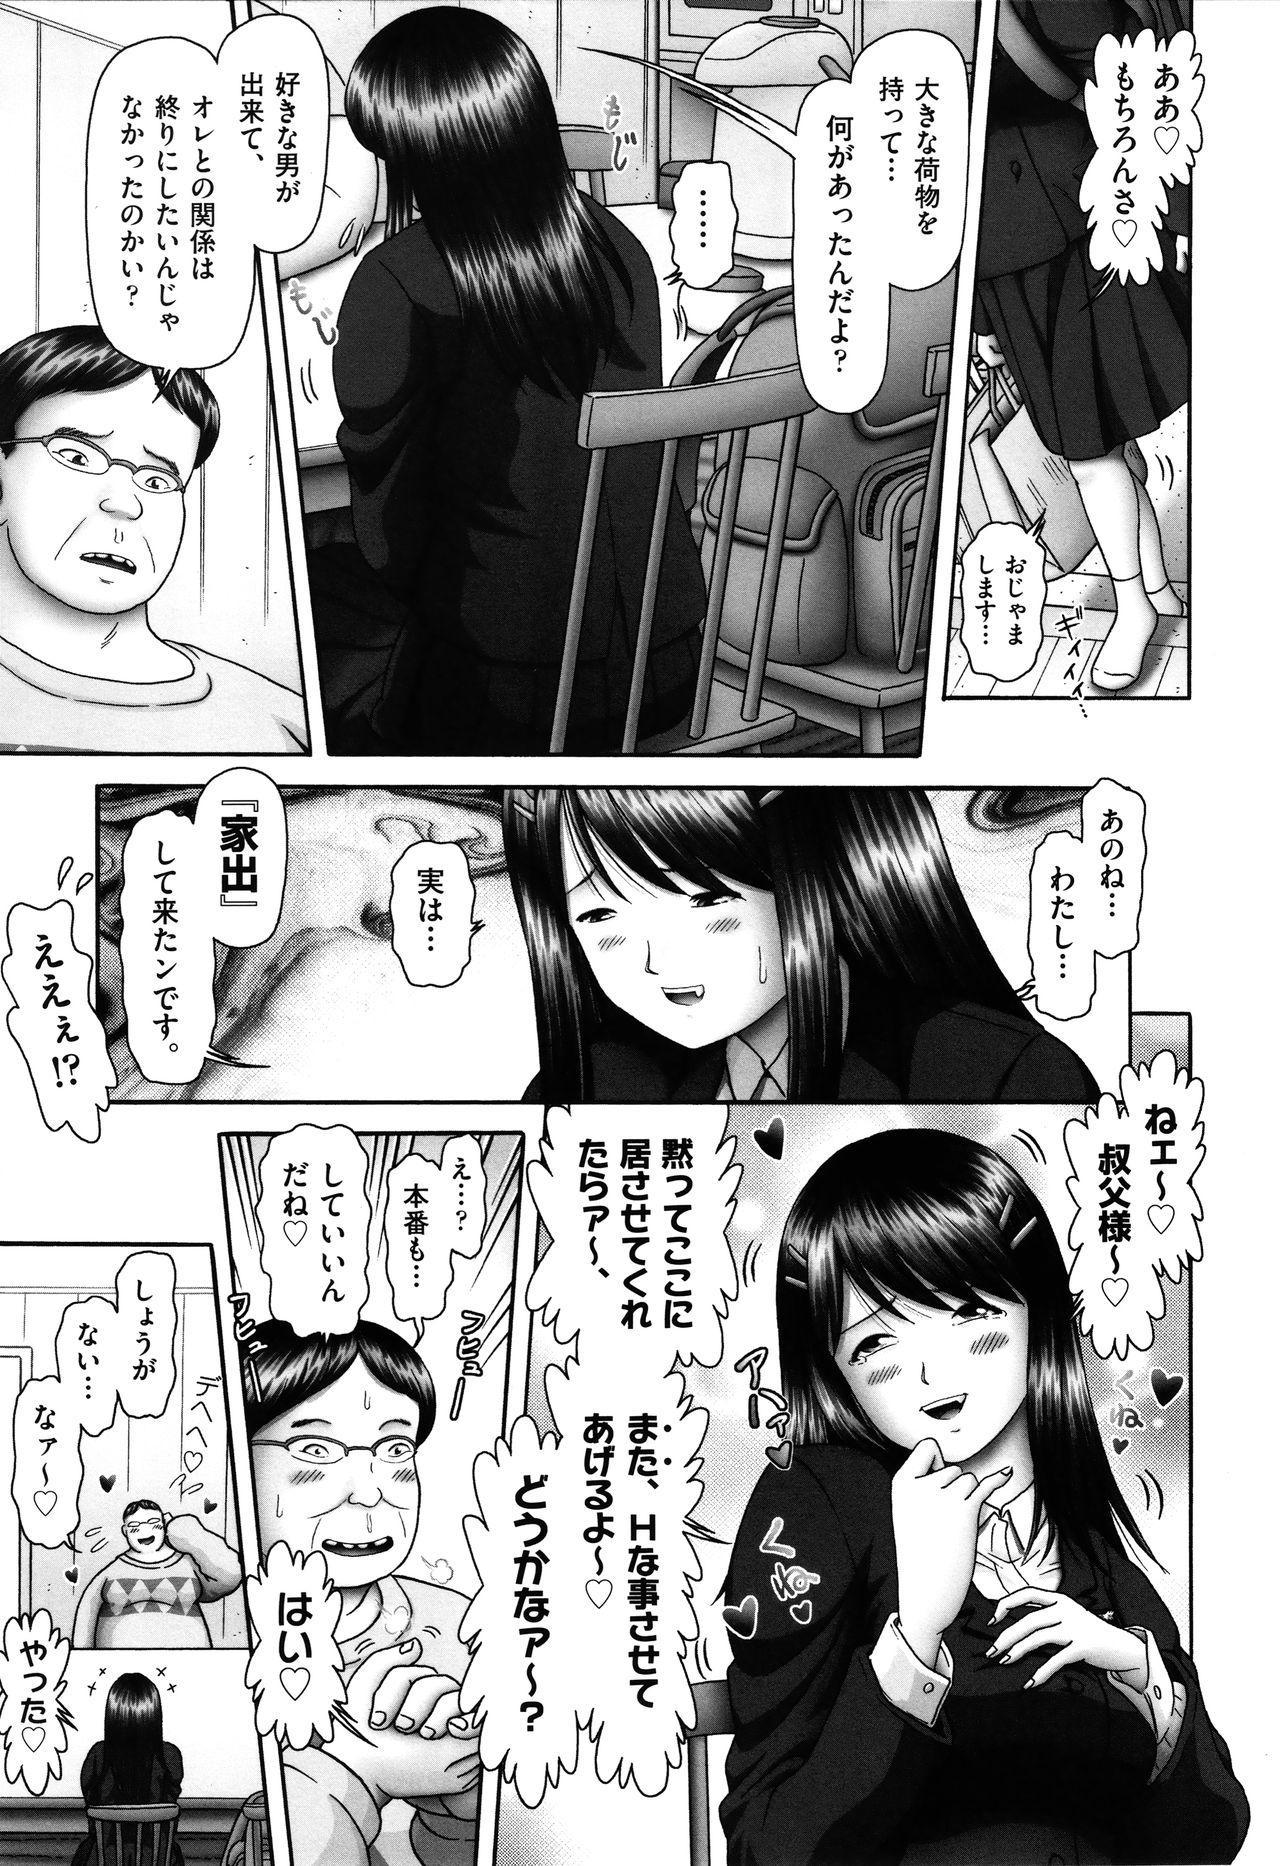 Shoujo Kumikyoku 17 5